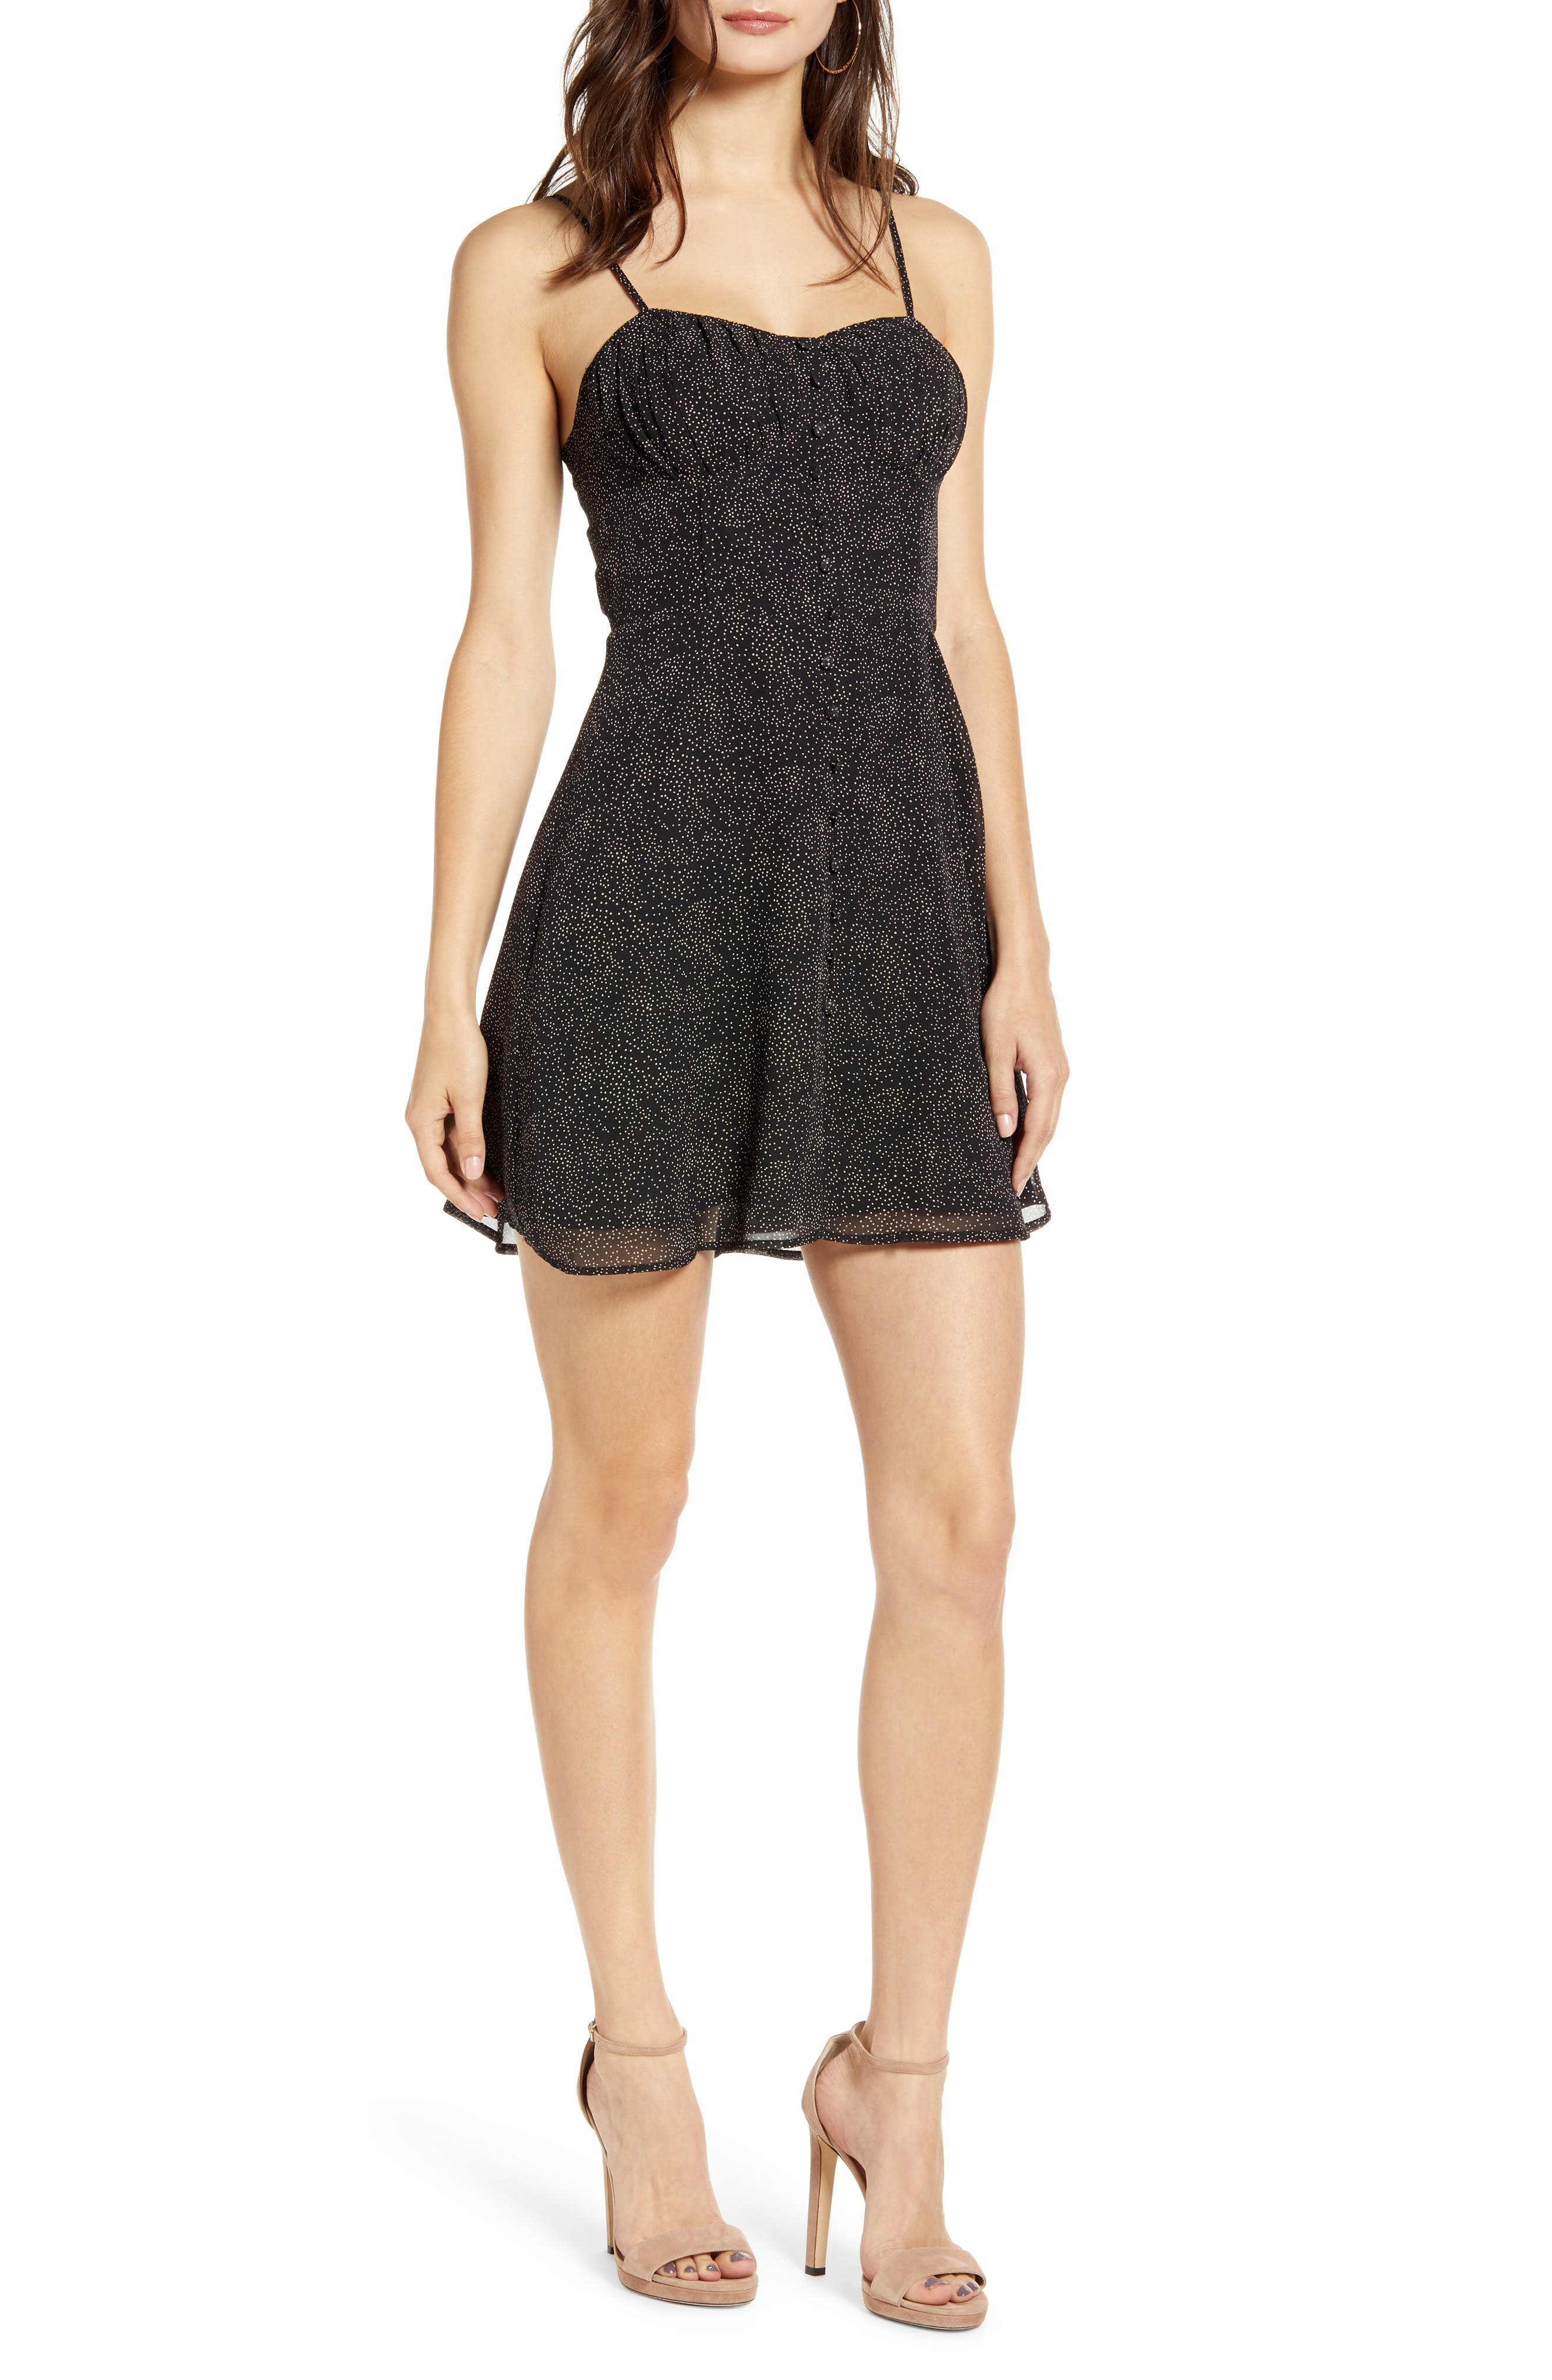 J.o.a. Sleeveless Minidress, Black